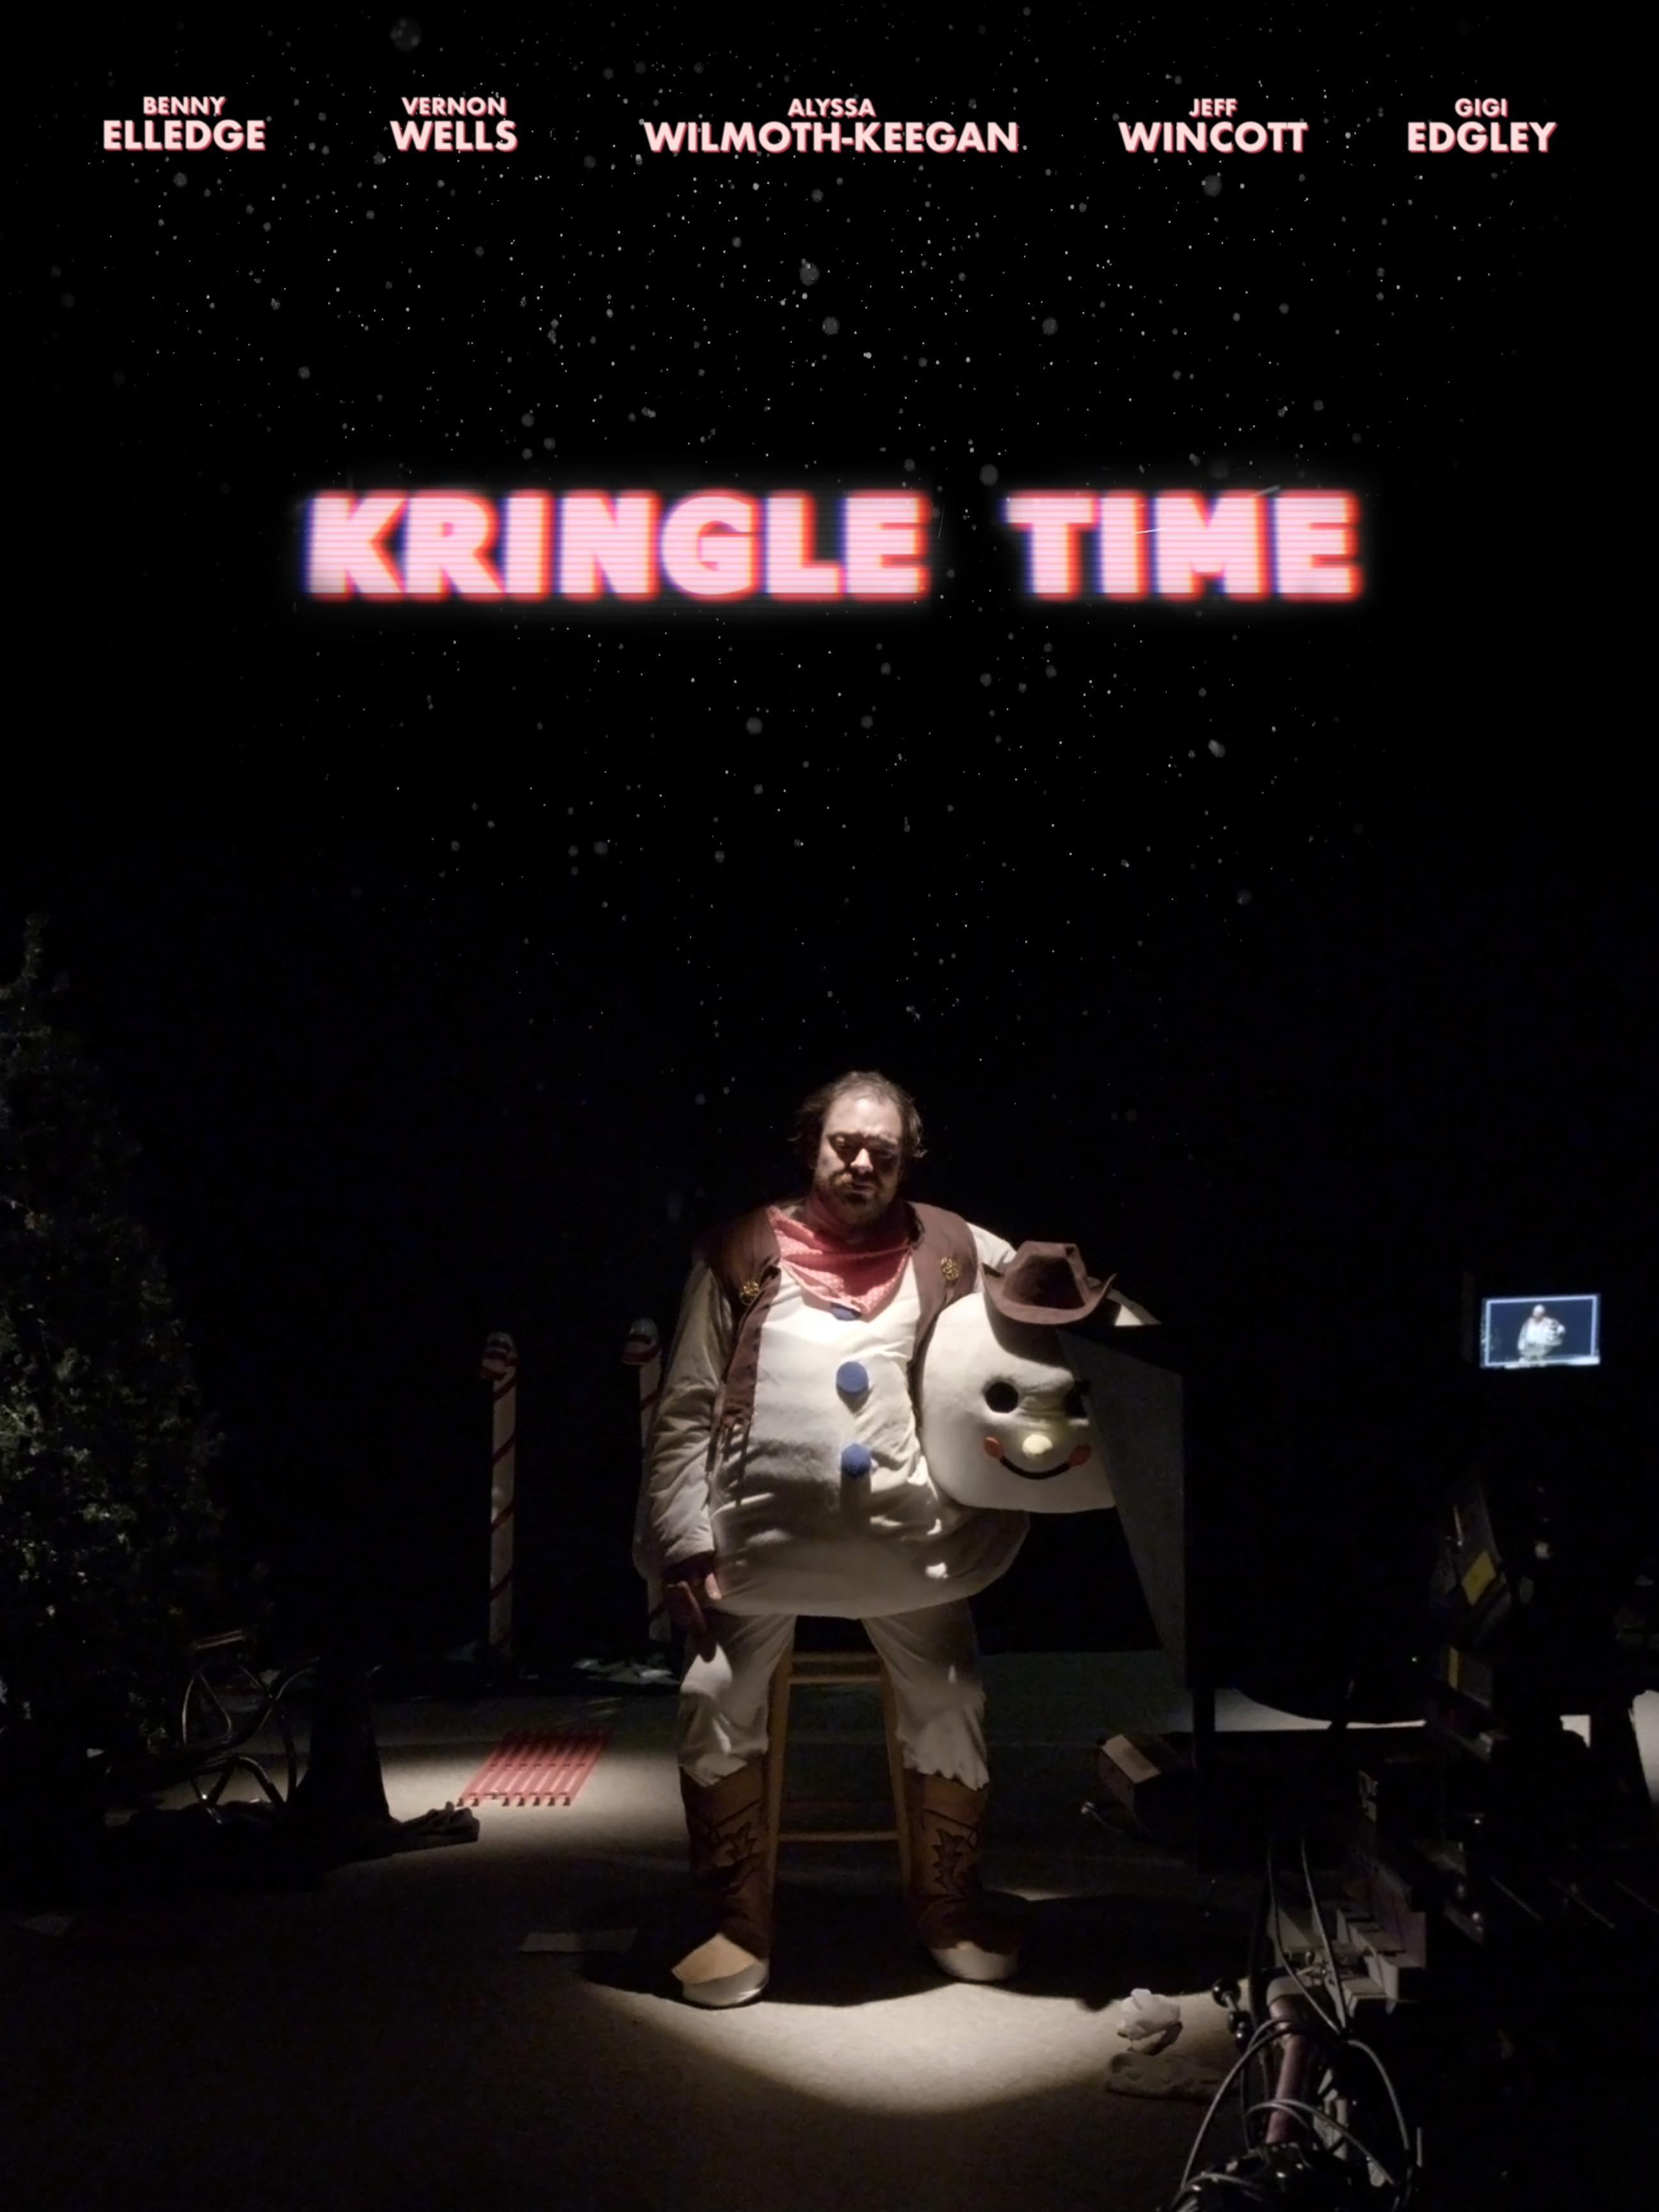 Kringle Time poster image